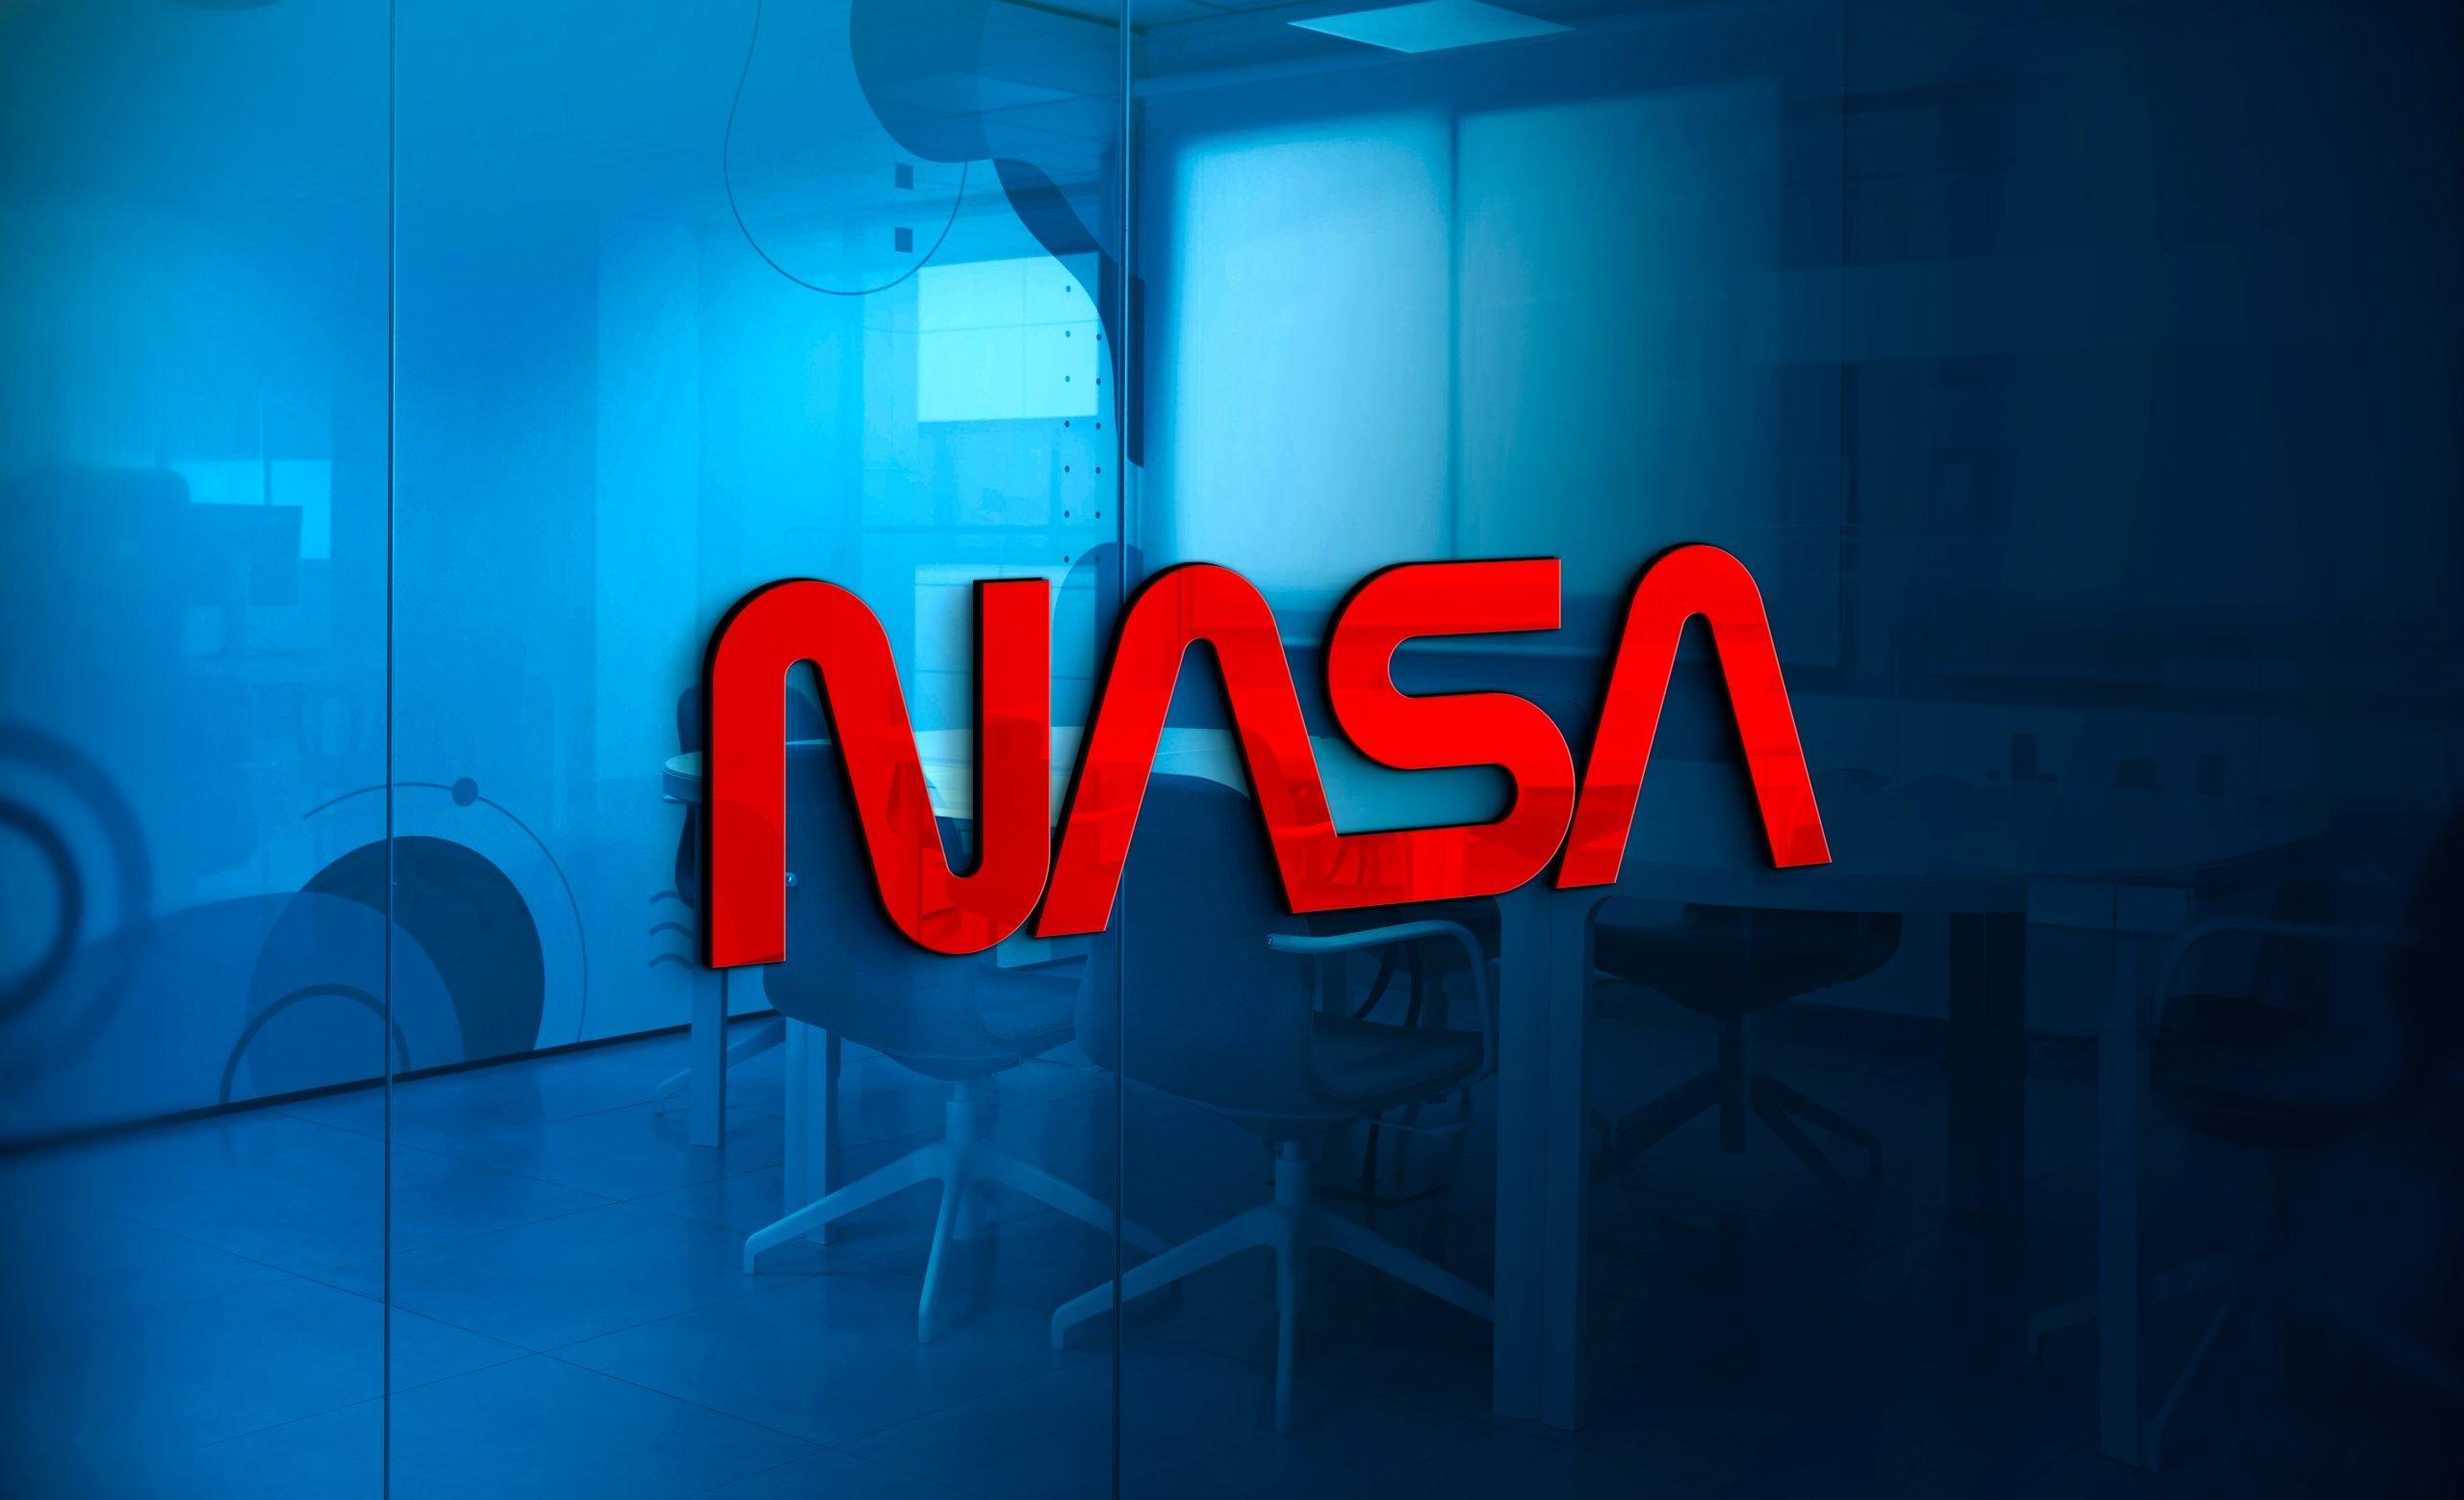 Nasa-Logo-3D-Logo-Mockup-on-Office-Glass-Wall